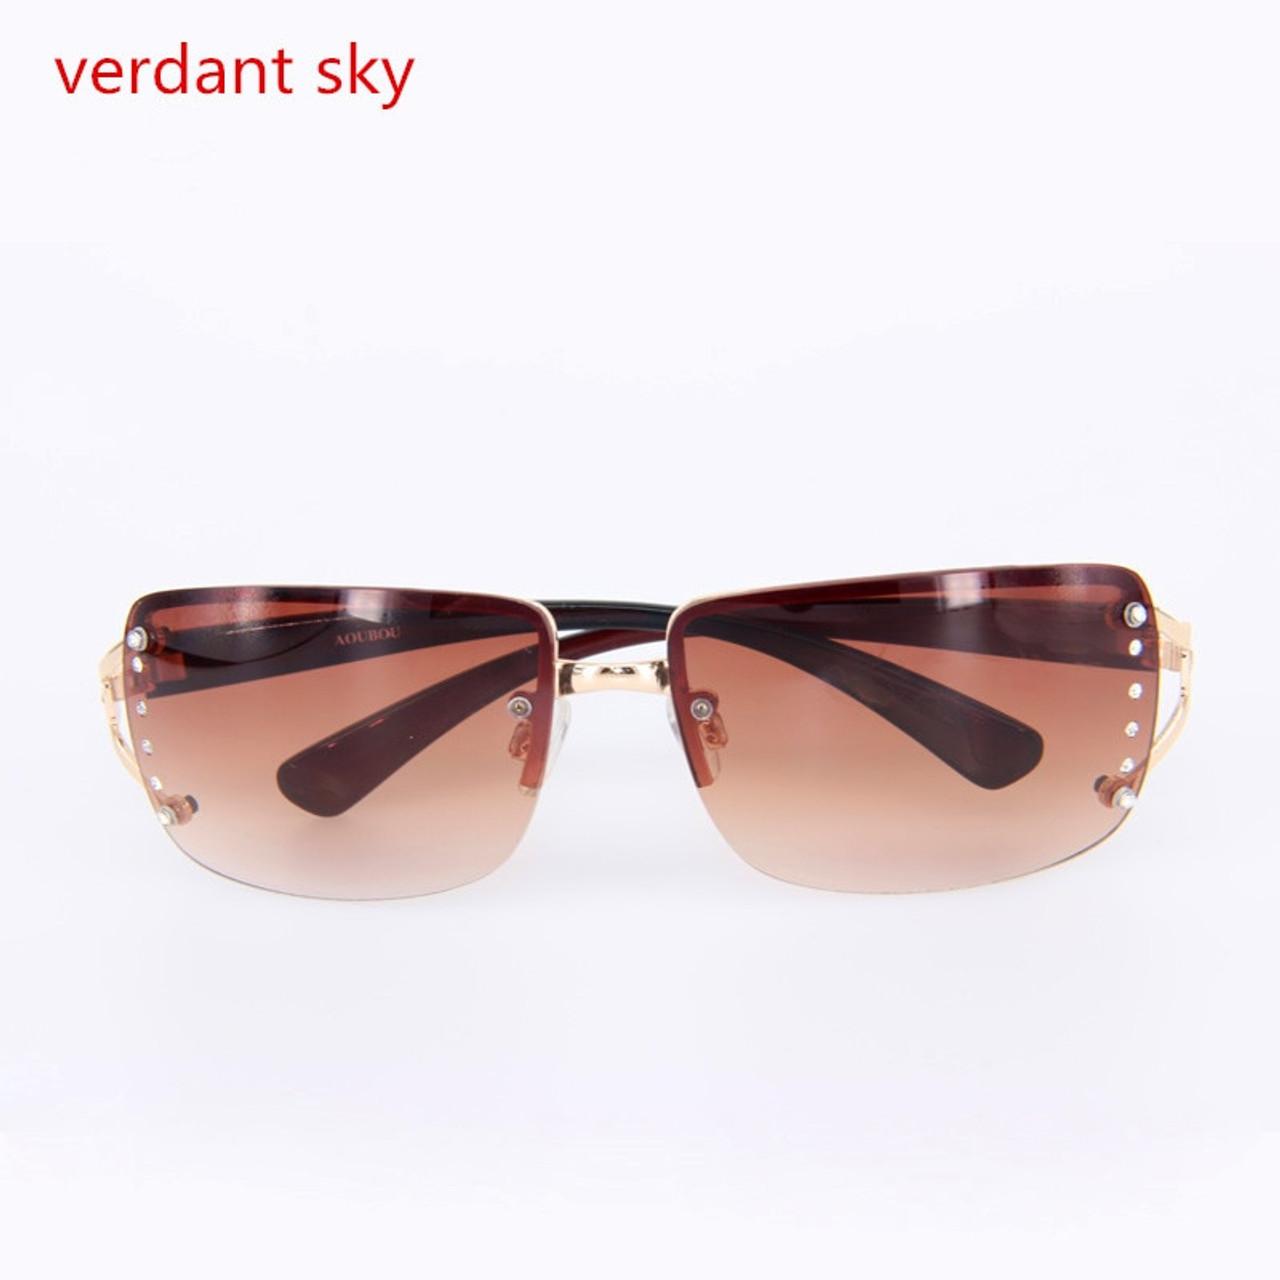 4e4e6022df7 2018 Rimless Sunglasses Women Luxury Diamond Design White Square Frame  Brand Sun Glasses For Women With 100% anti ultraviolet - OnshopDeals.Com